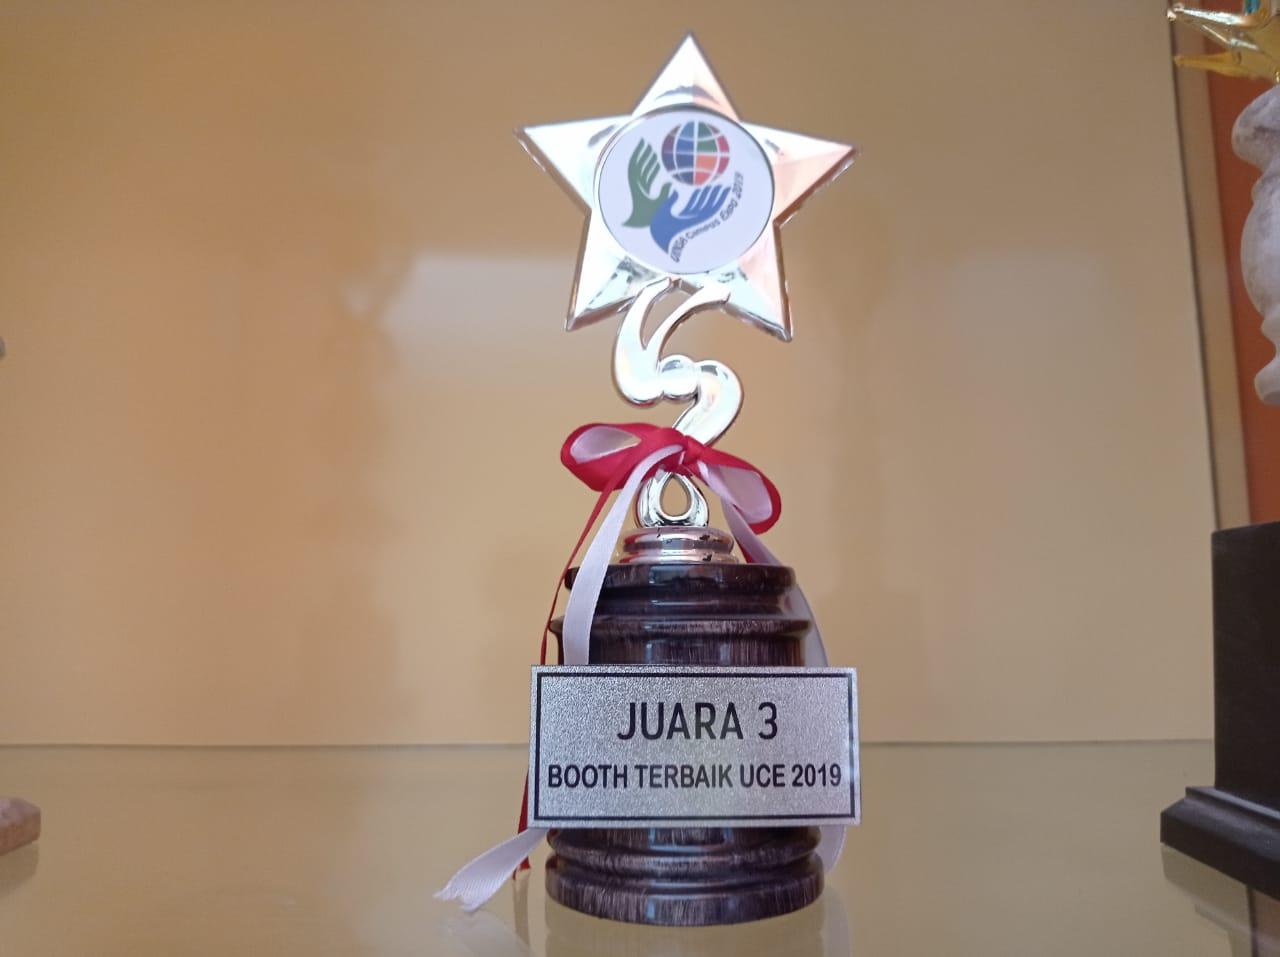 JUARA III BOOTH TERBAIK UCE 2019